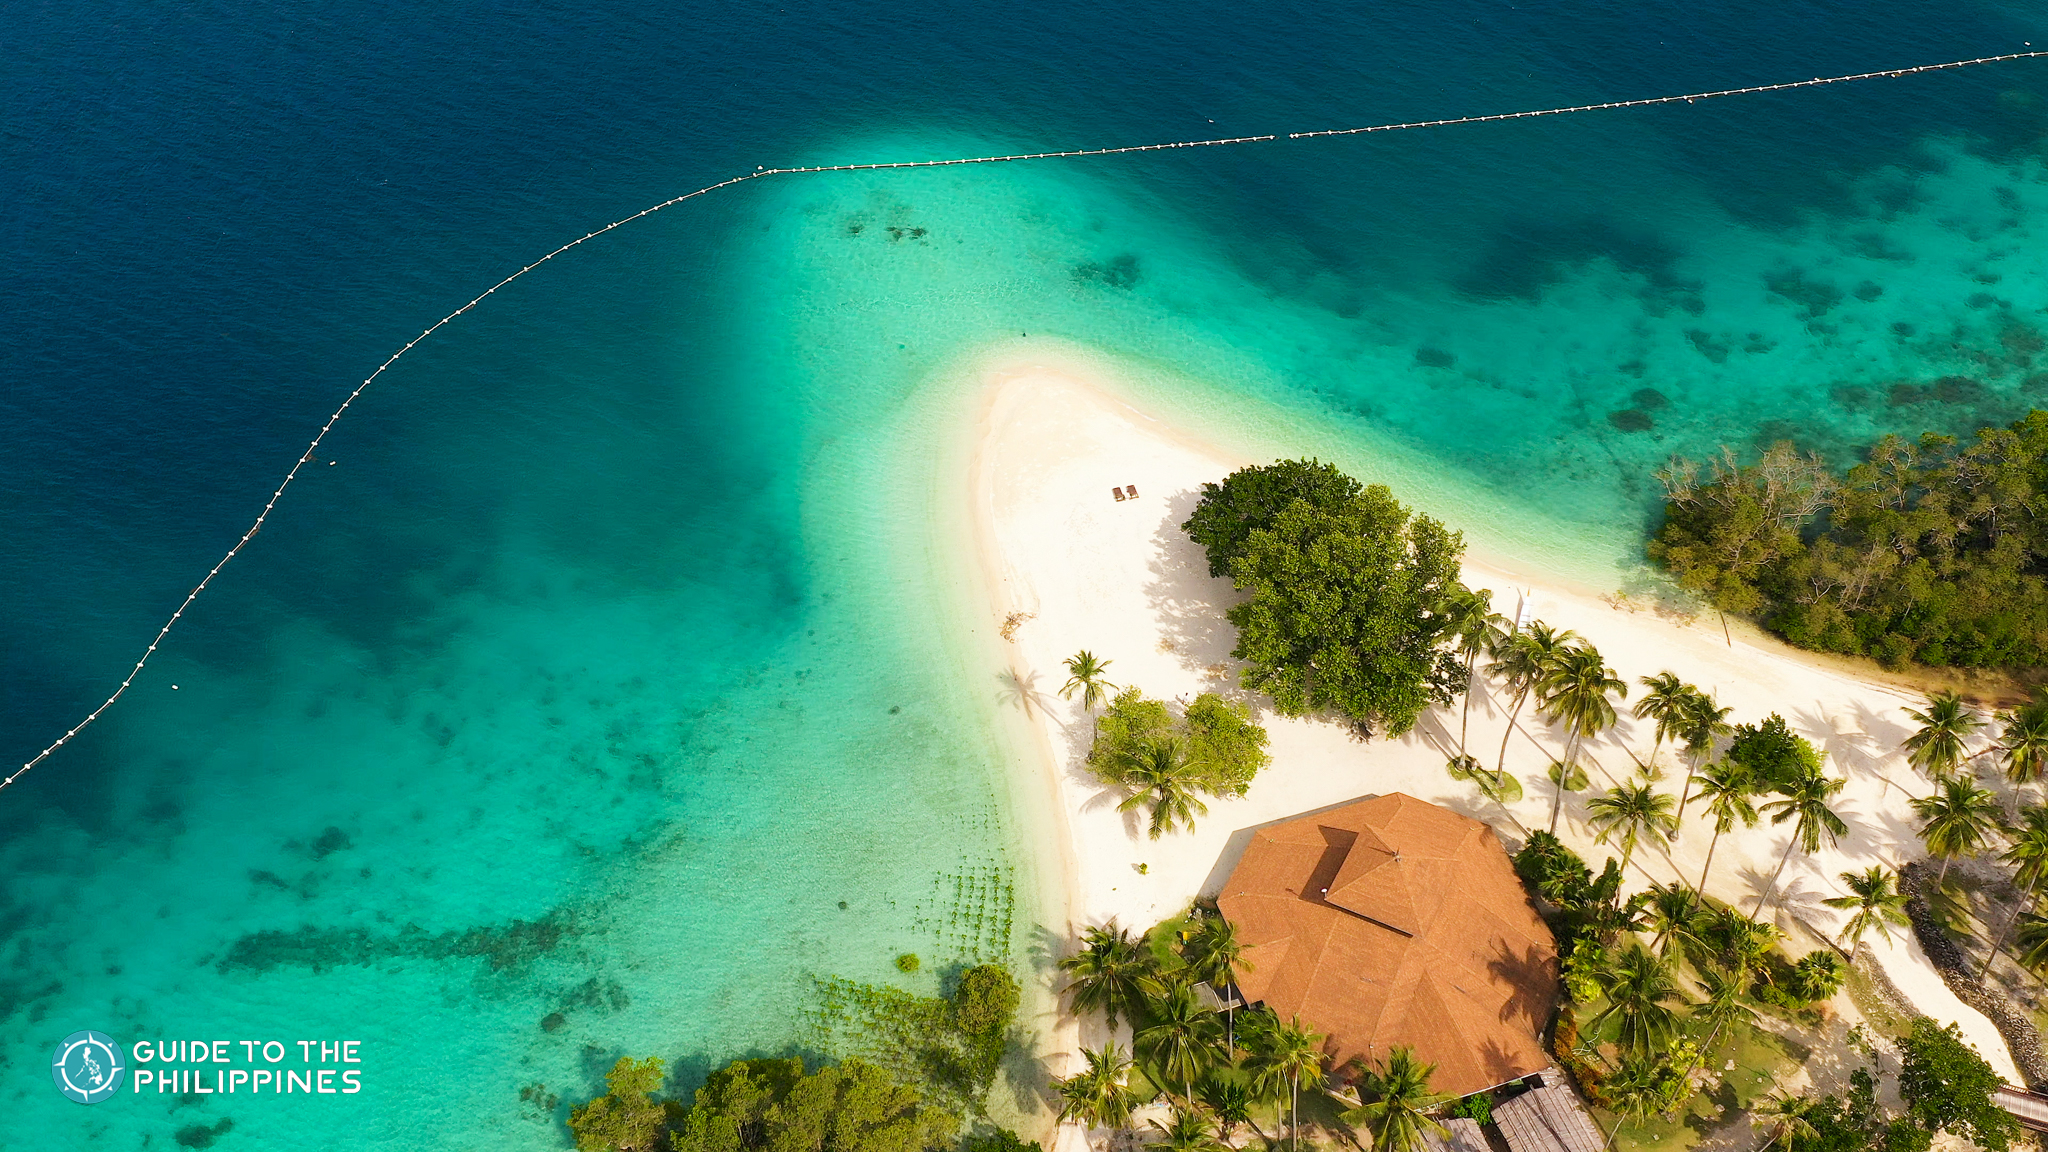 10 Best Samal Island Davao Resorts: Beachfront, Budget-Friendly, With Pool